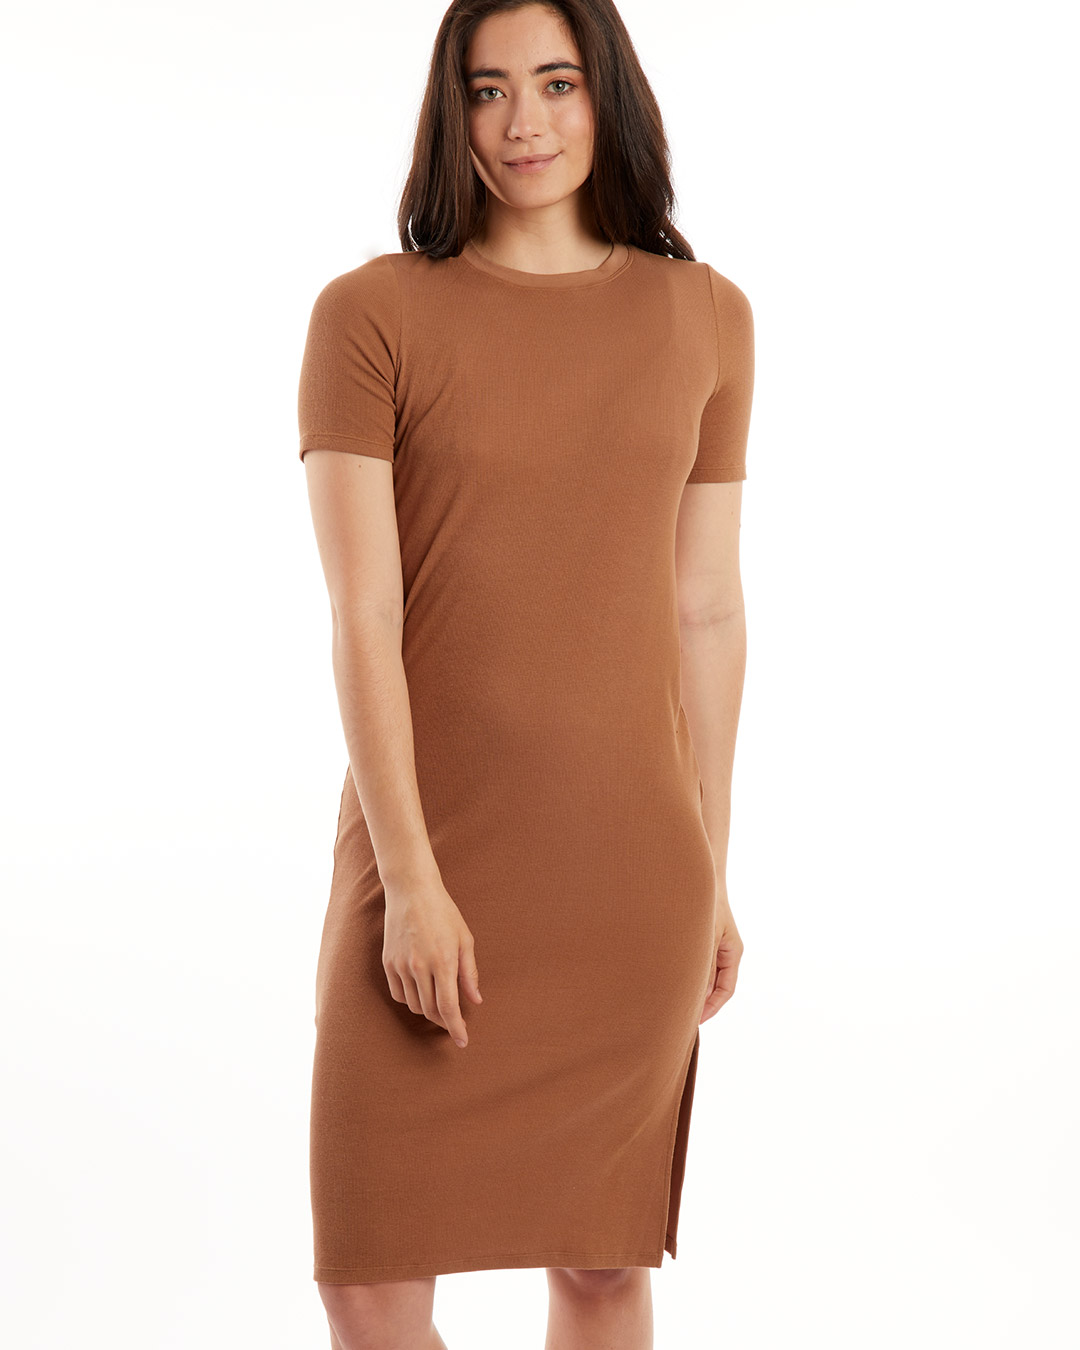 paper-label-shiloh-dress-timber-tan-front-dianes-lingerie-vancouver-1080x1350